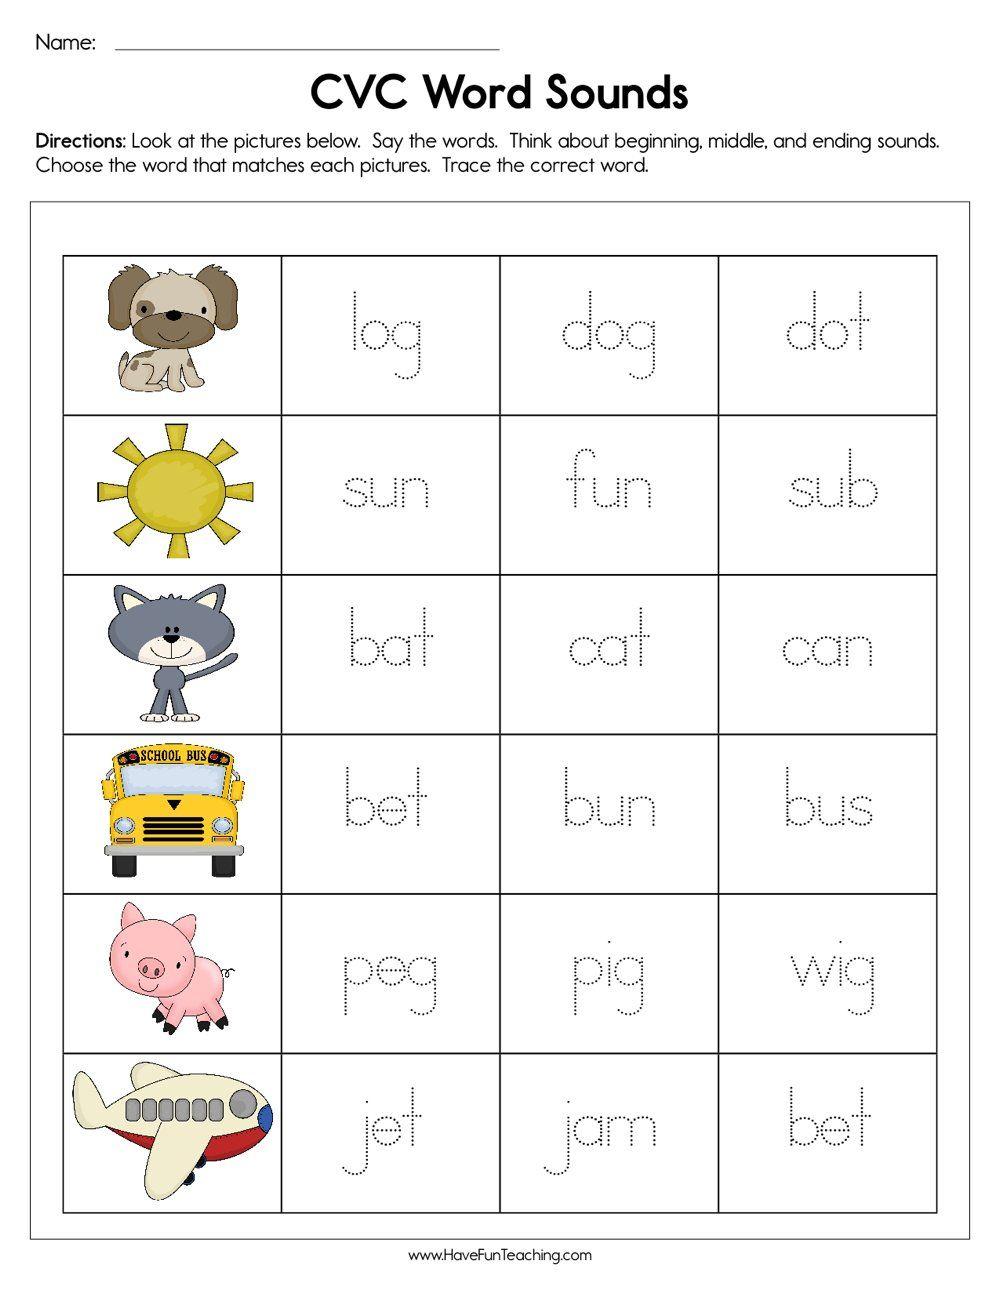 Cvc Word Sounds Worksheet In 2020 | Cvc Words Kindergarten